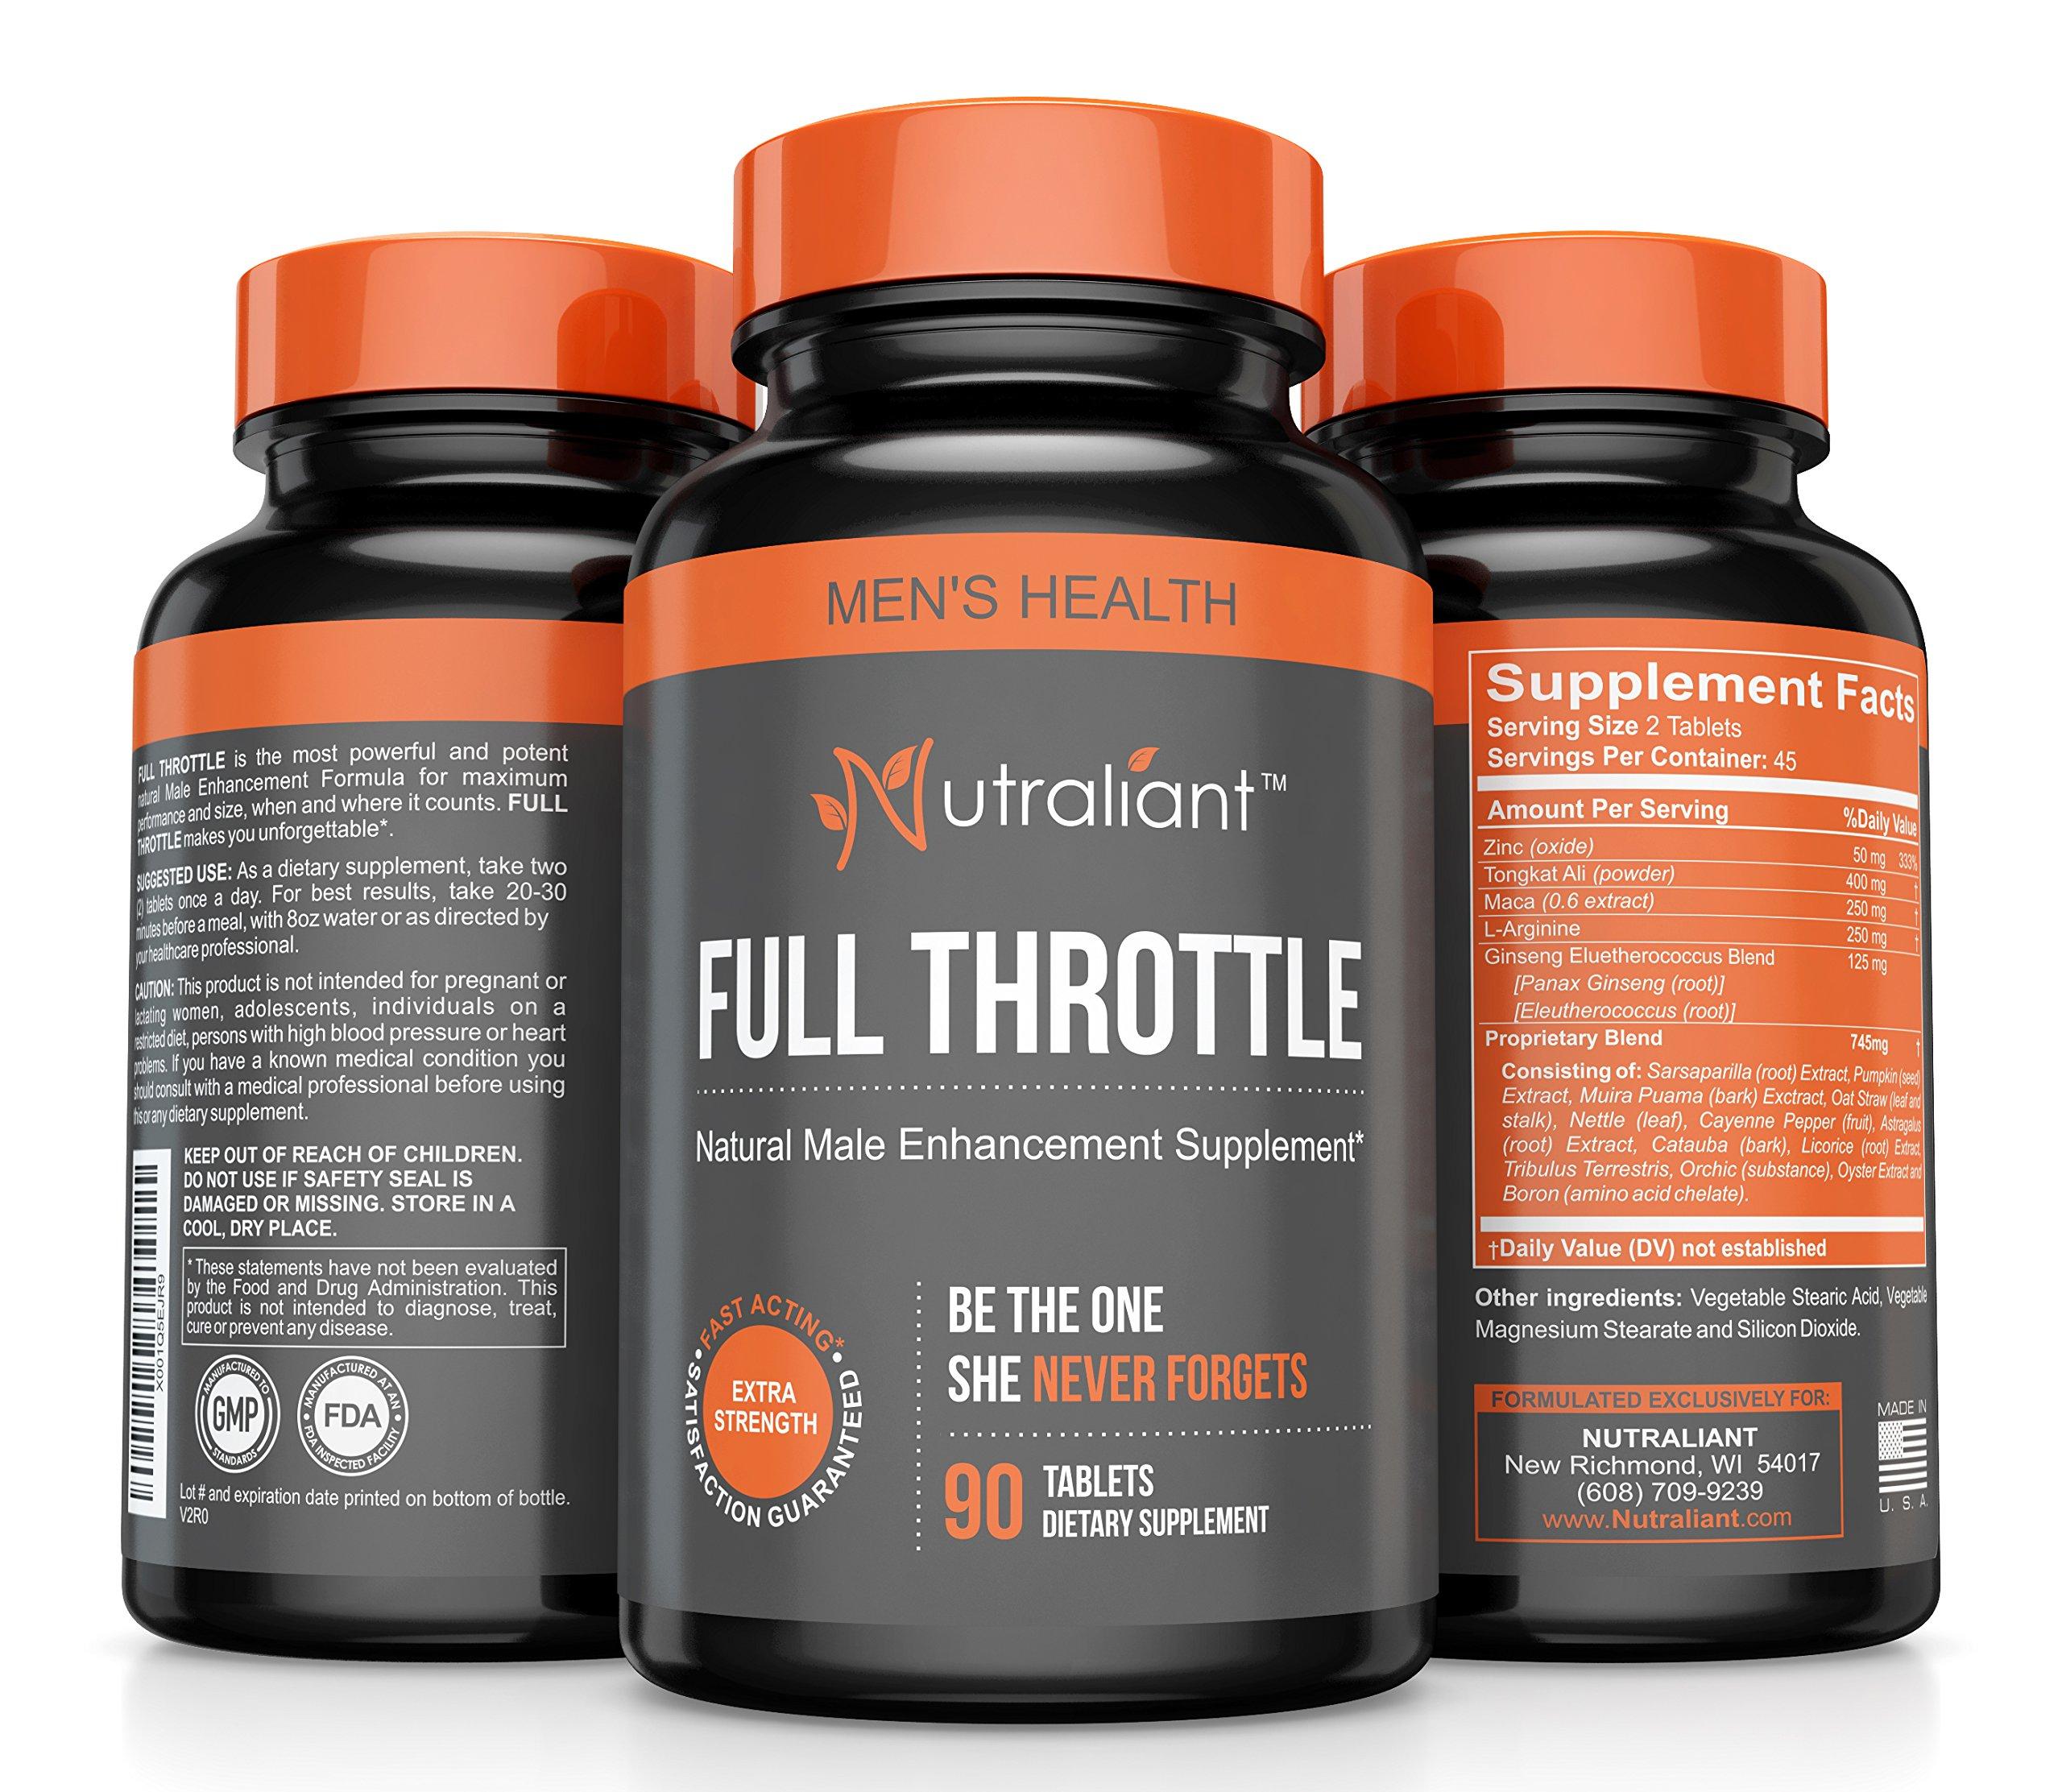 Full Throttle #1 Male Enhancement Pills - Testosterone Booster for Men – Increase Size, Blood Flow, Libido, Performance - Potent & Powerful Enhancing Supplement w L Arginine, Maca, Tongkat, Ginseng